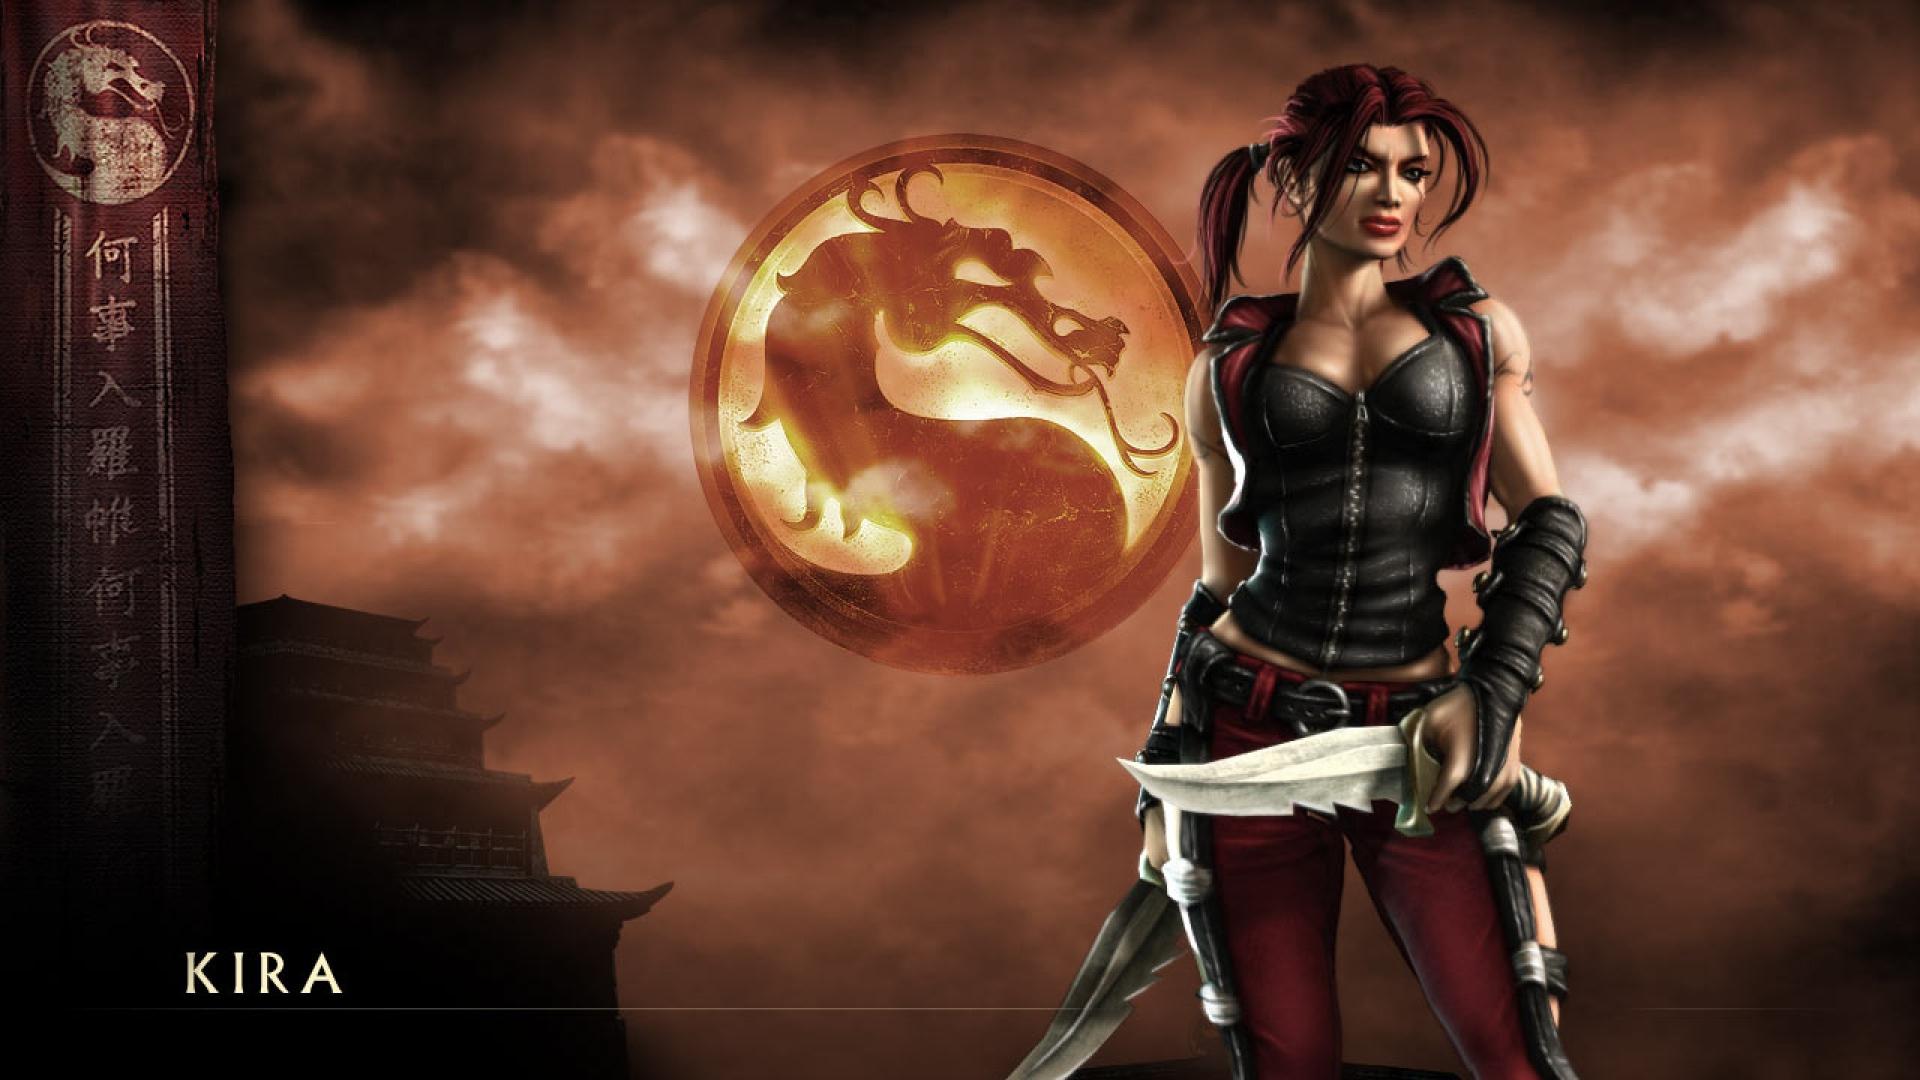 Full Contact Combat Sport >> Download Wallpaper 1920x1080 mortal kombat deception, kira, girl, dragon, knifes Full HD 1080p ...